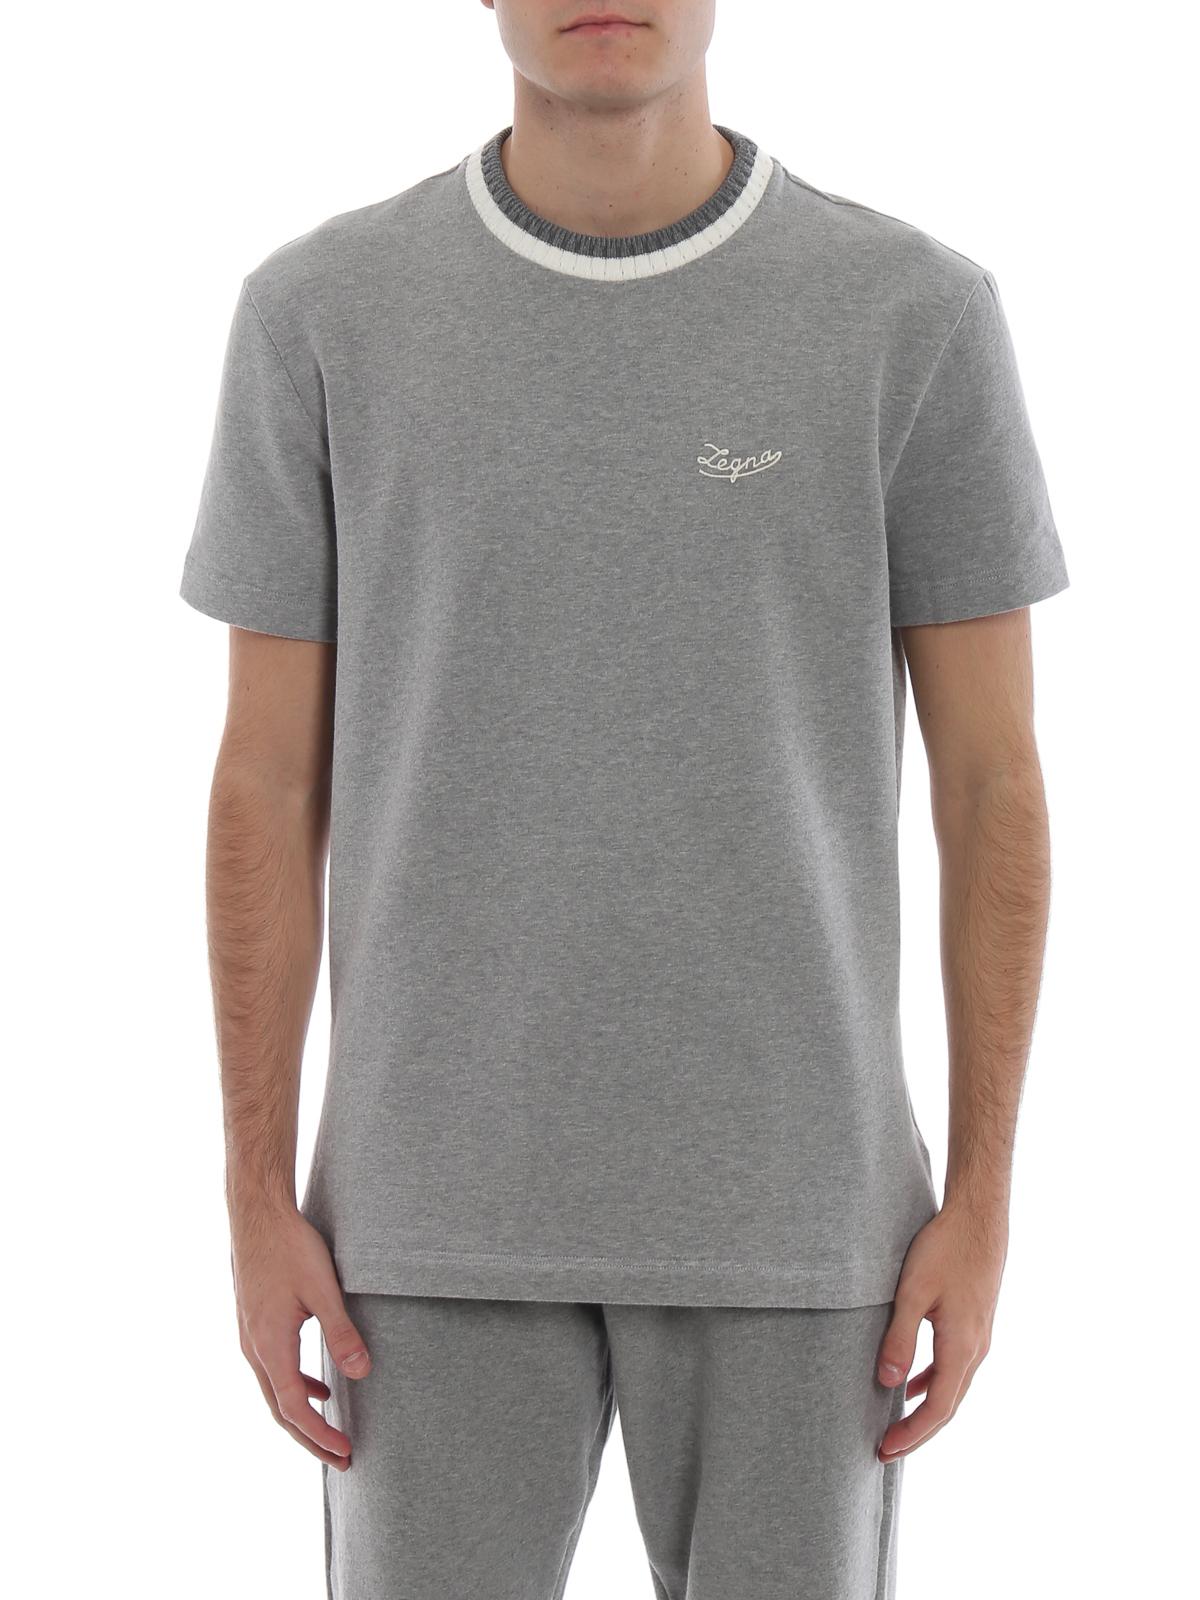 23730eaf Ermenegildo Zegna - Cotton fleece short sleeve grey T-shirt - t ...